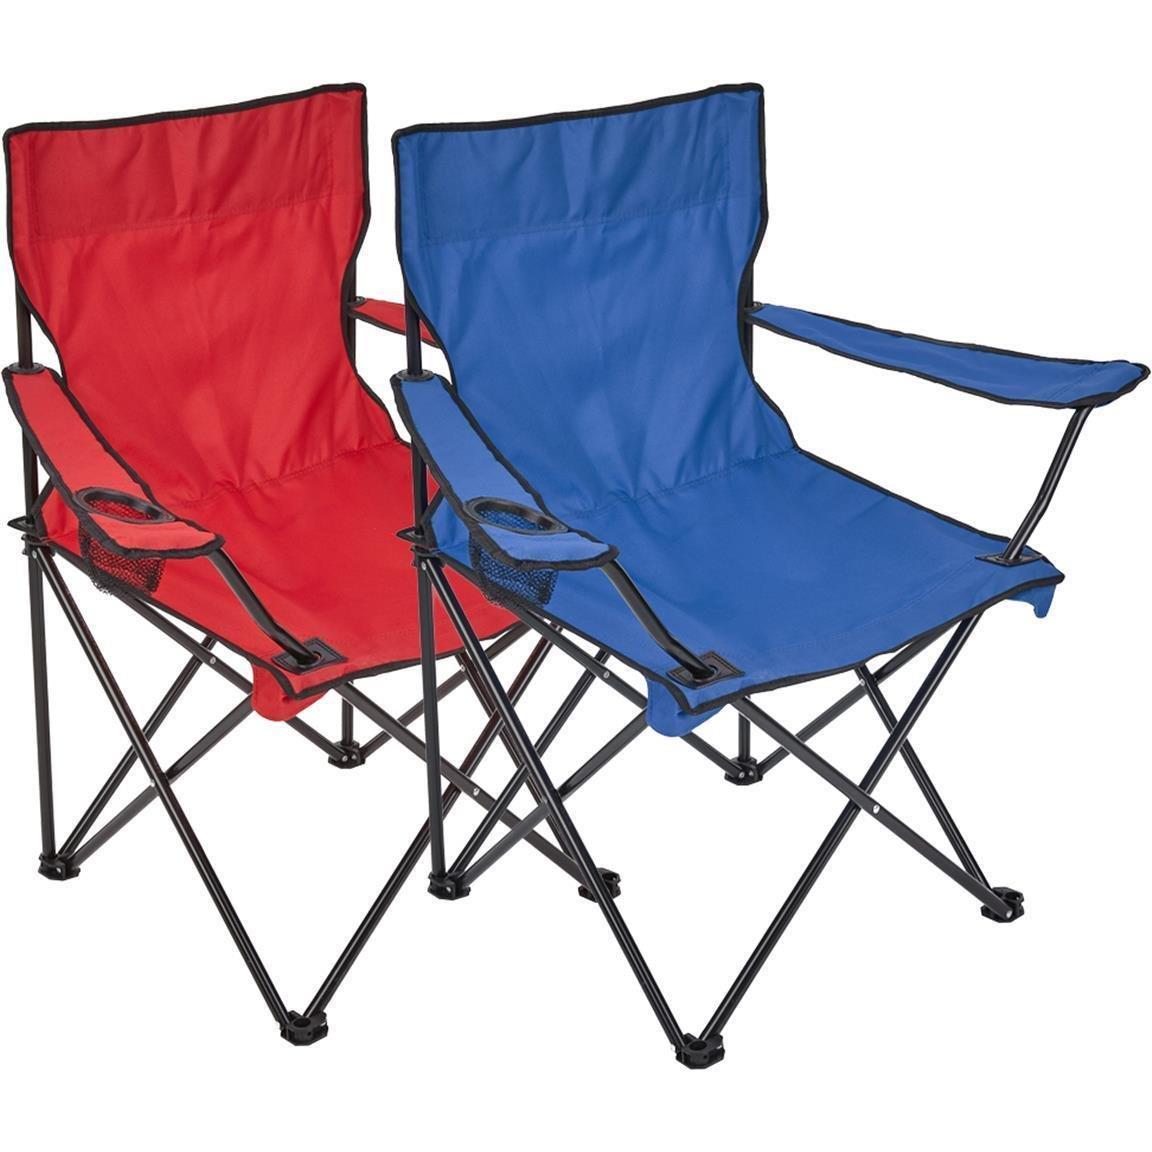 Silla plegable, 2 unidades, silla de camping con soporte para bebidas en reposabrazos,